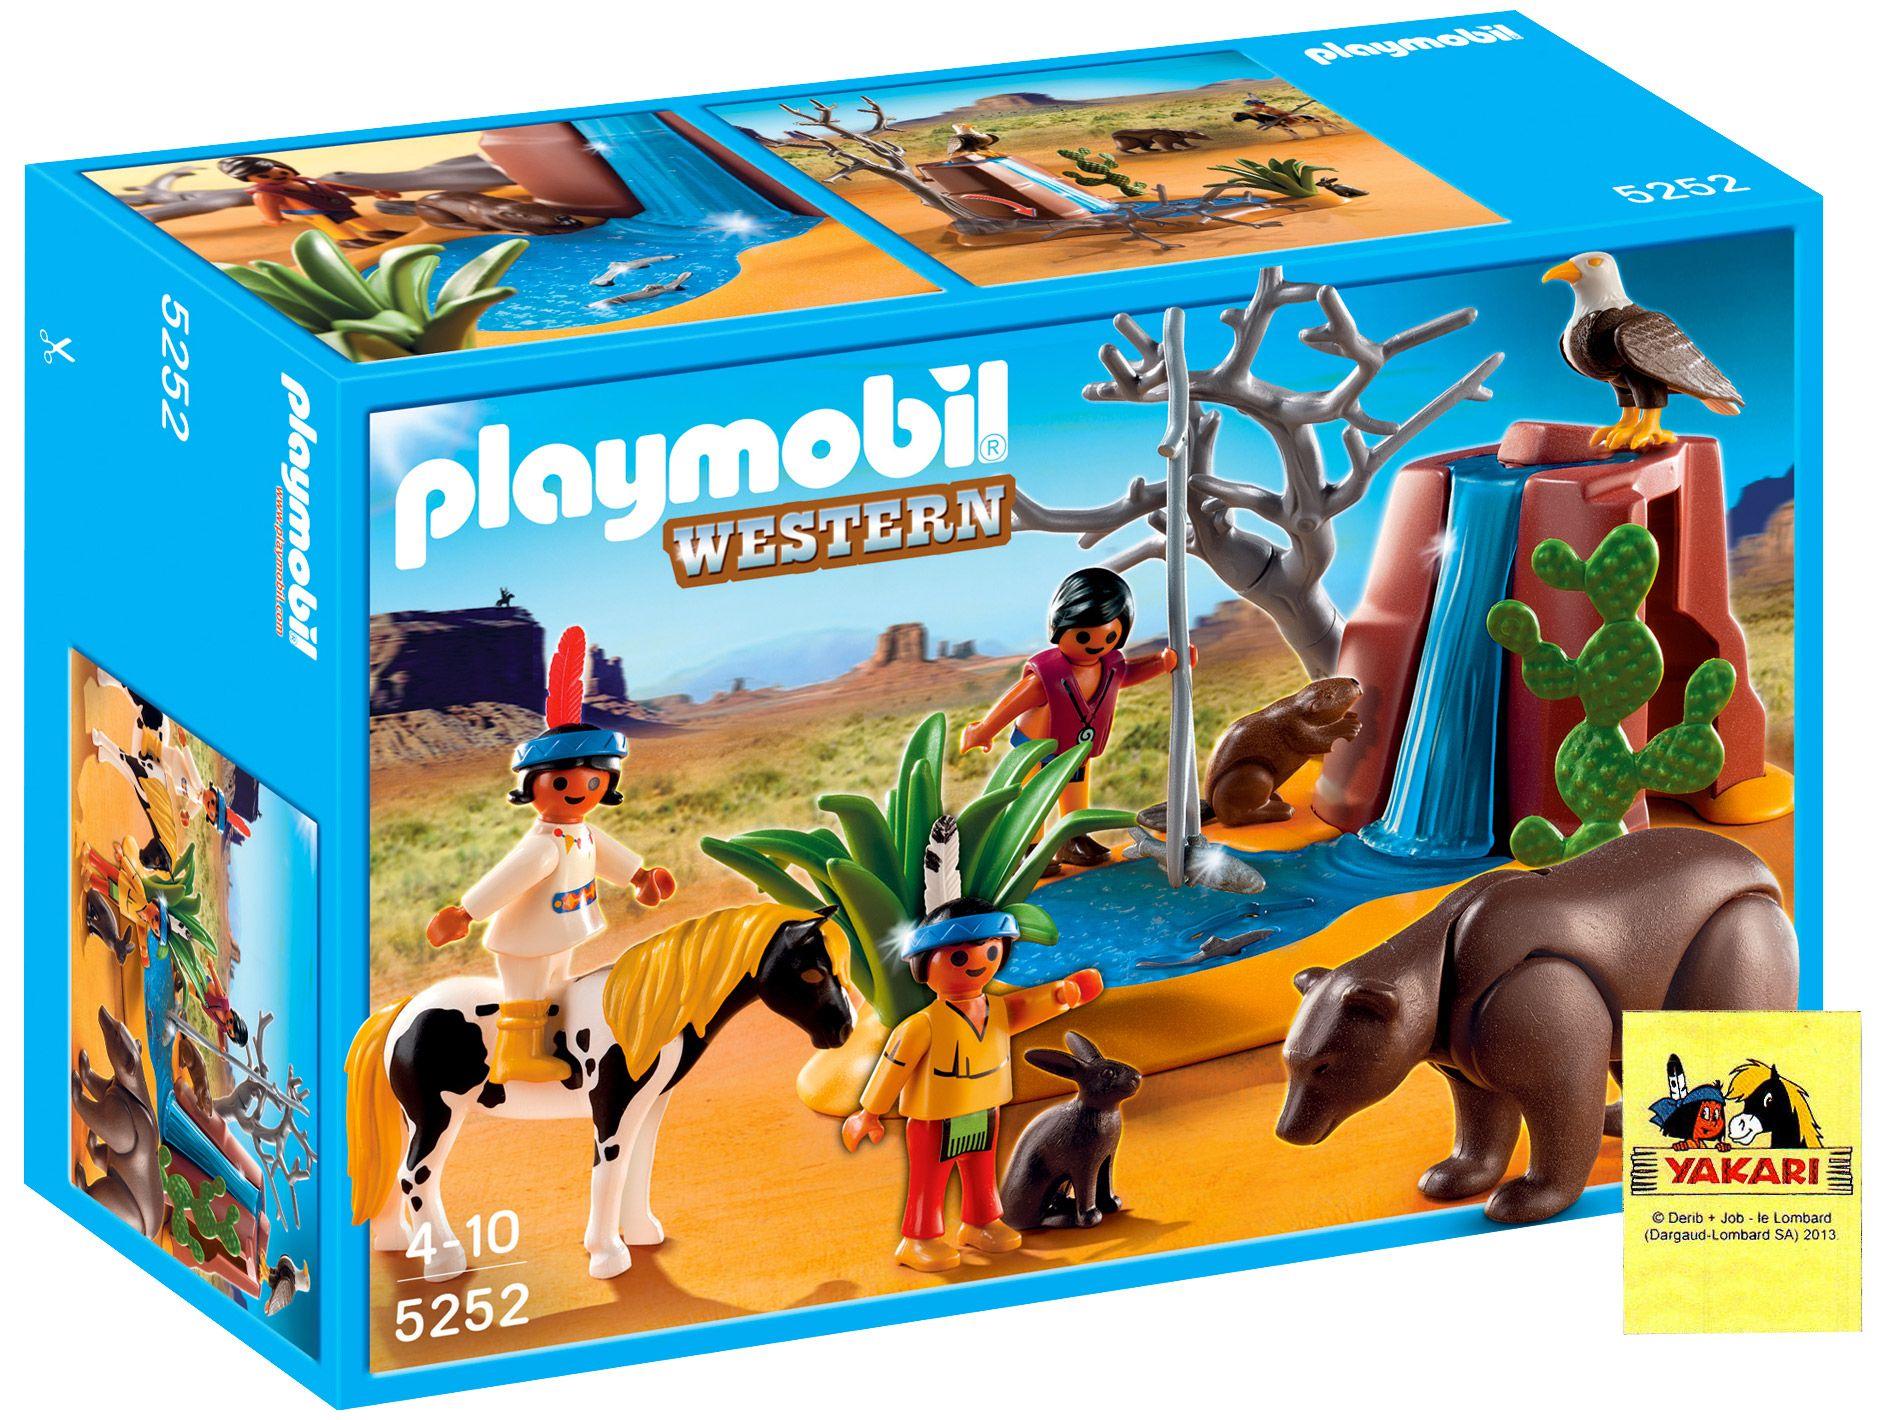 Playmobil Western 5252 Enfants Indiens Avec Animaux Yakari Playmobil Western Animaux Playmobil Indien